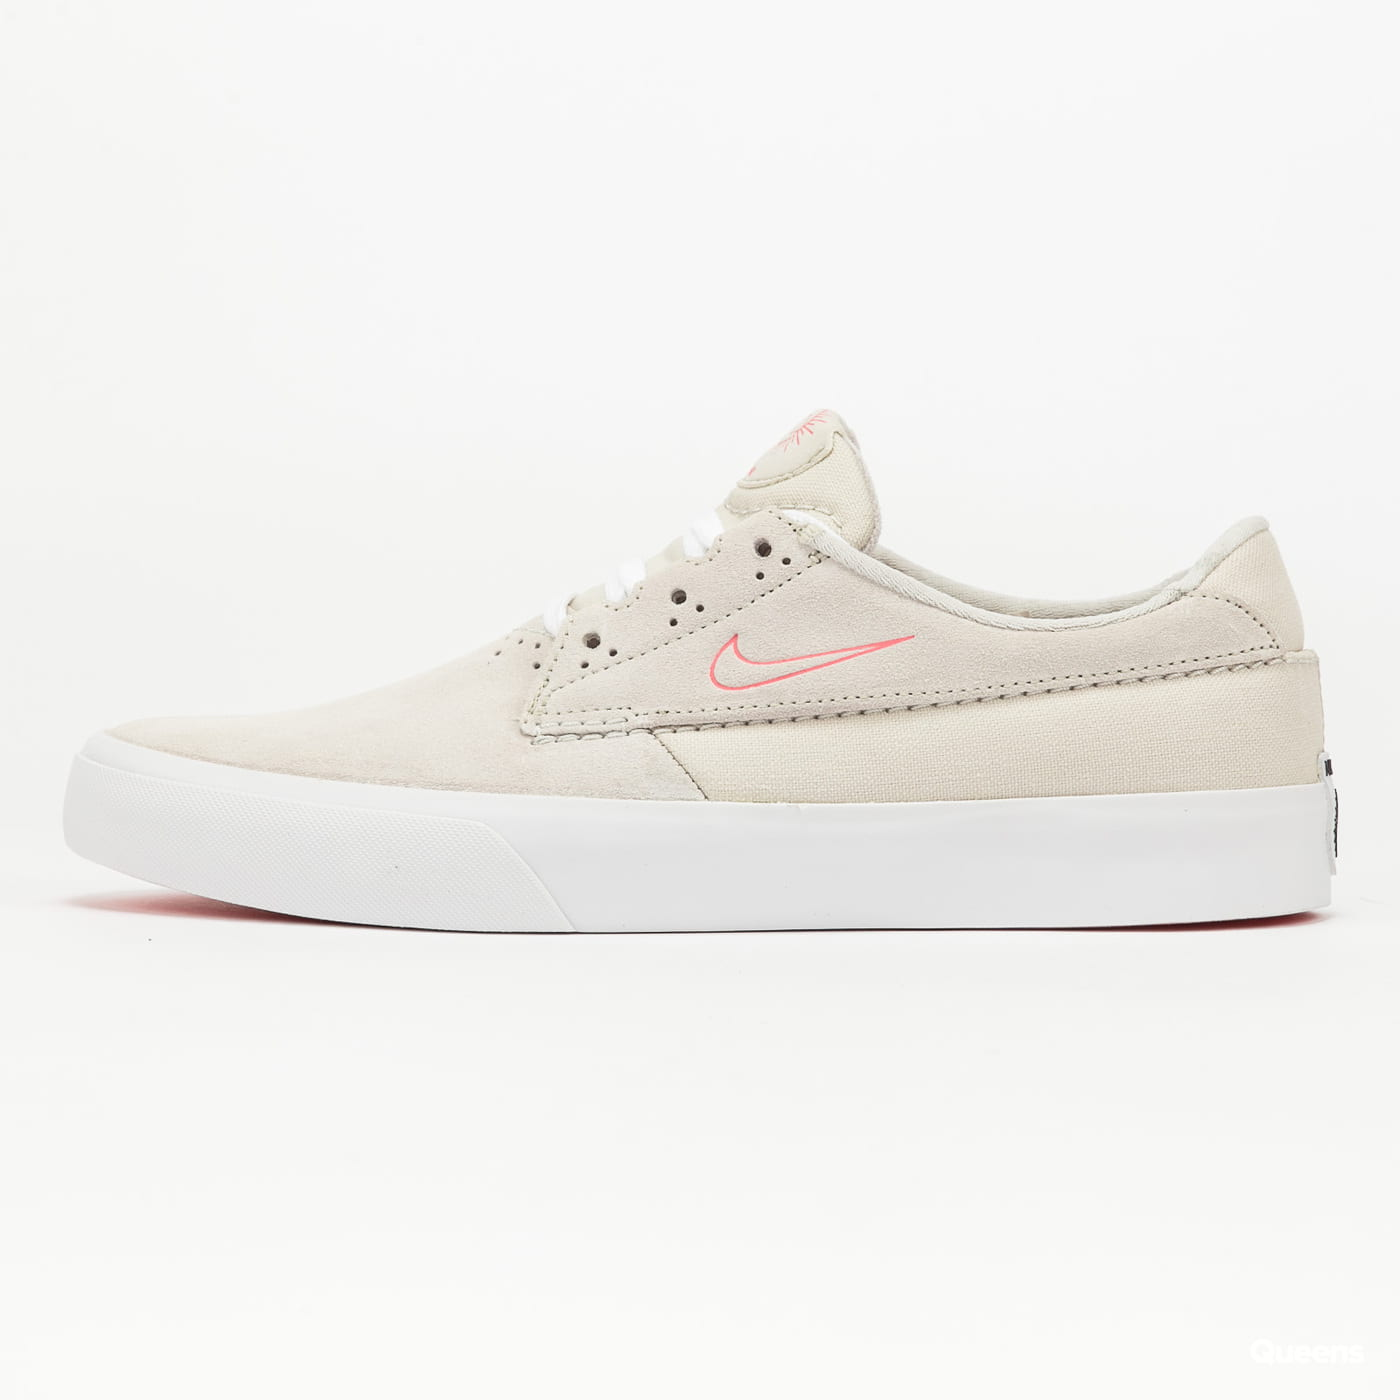 Nike SB Shane summit white / pink salt